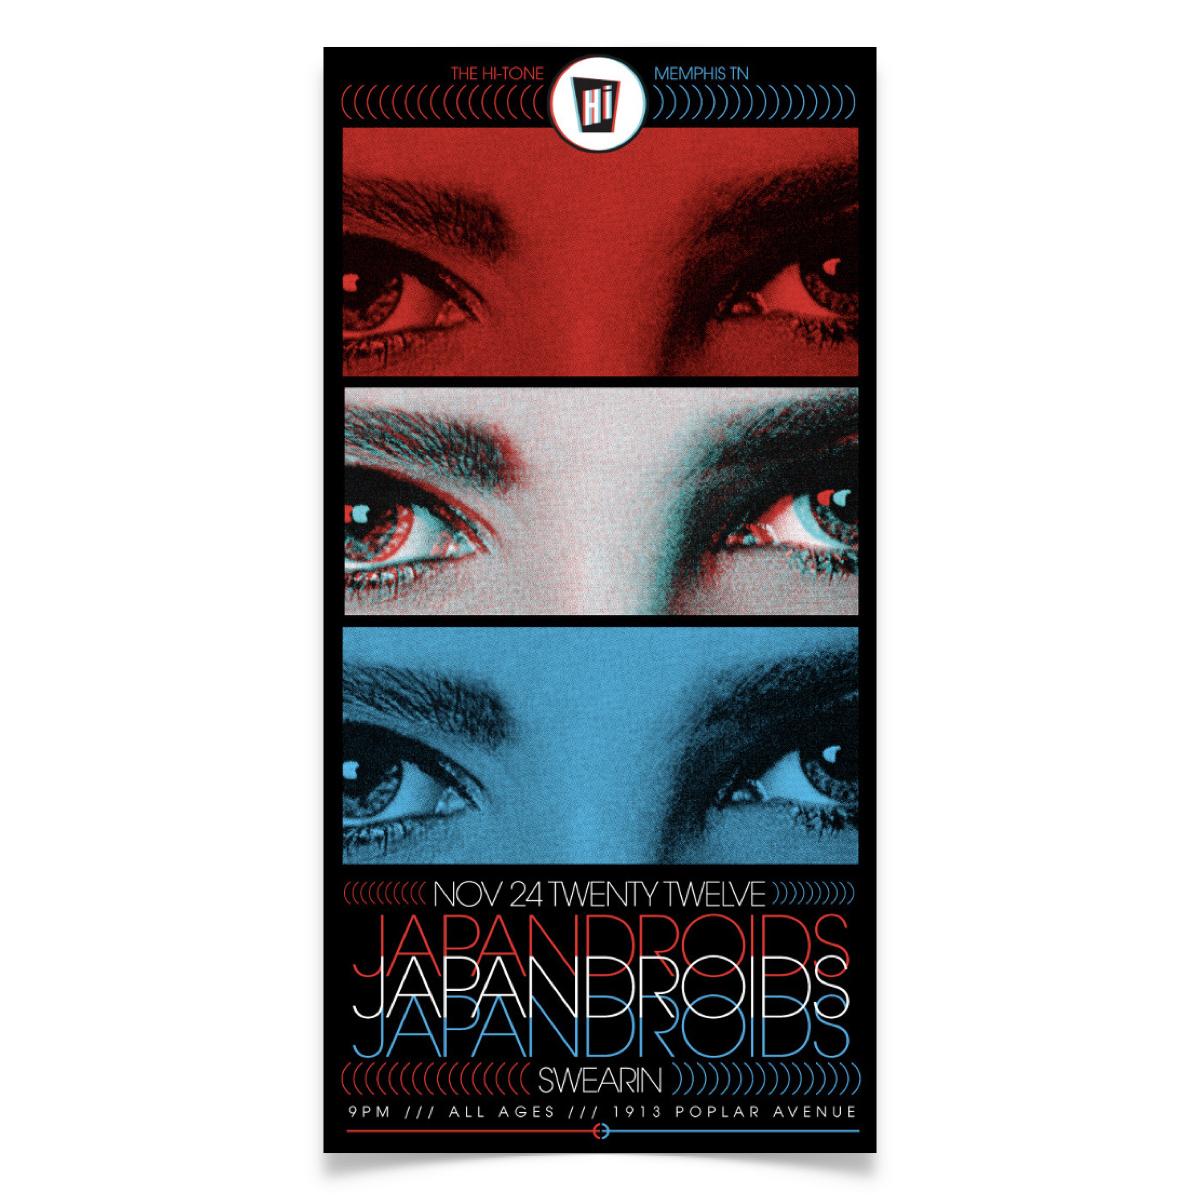 SFER-Posters-Japandroids.jpeg